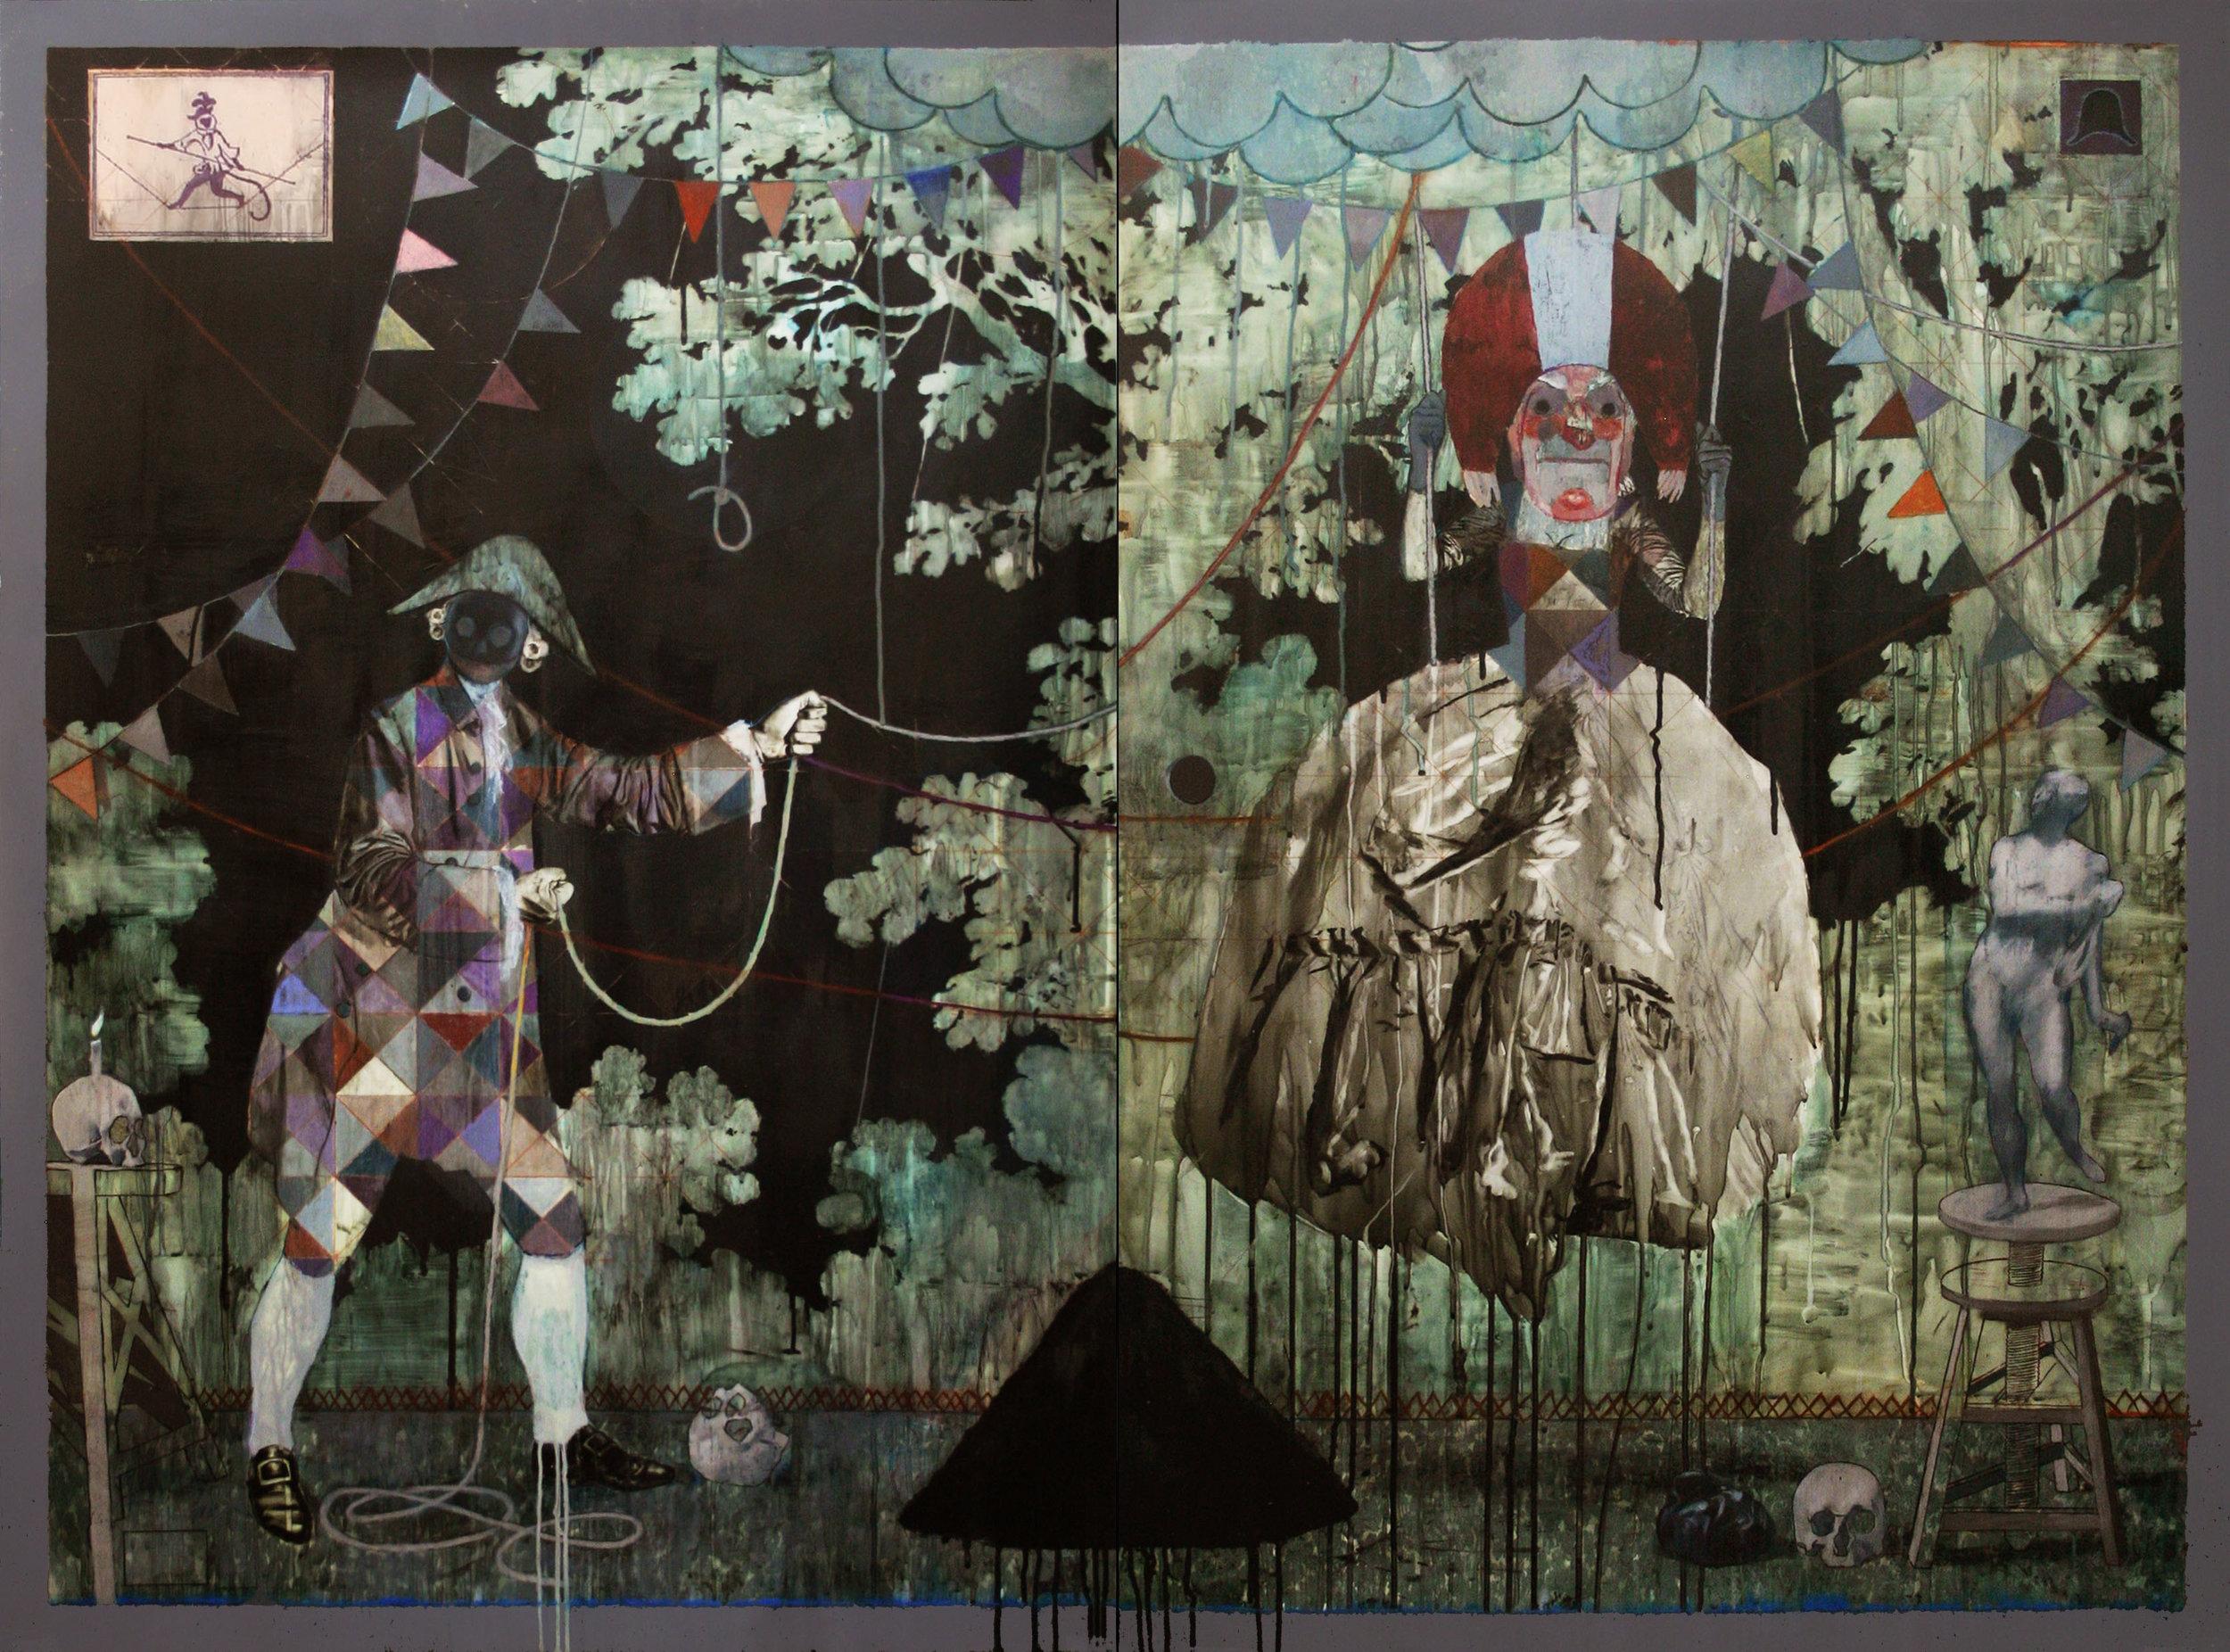 L'Escarpolette ou l'implacable pantomime  2016, Mixed media on drafting film 122 x 168 cm